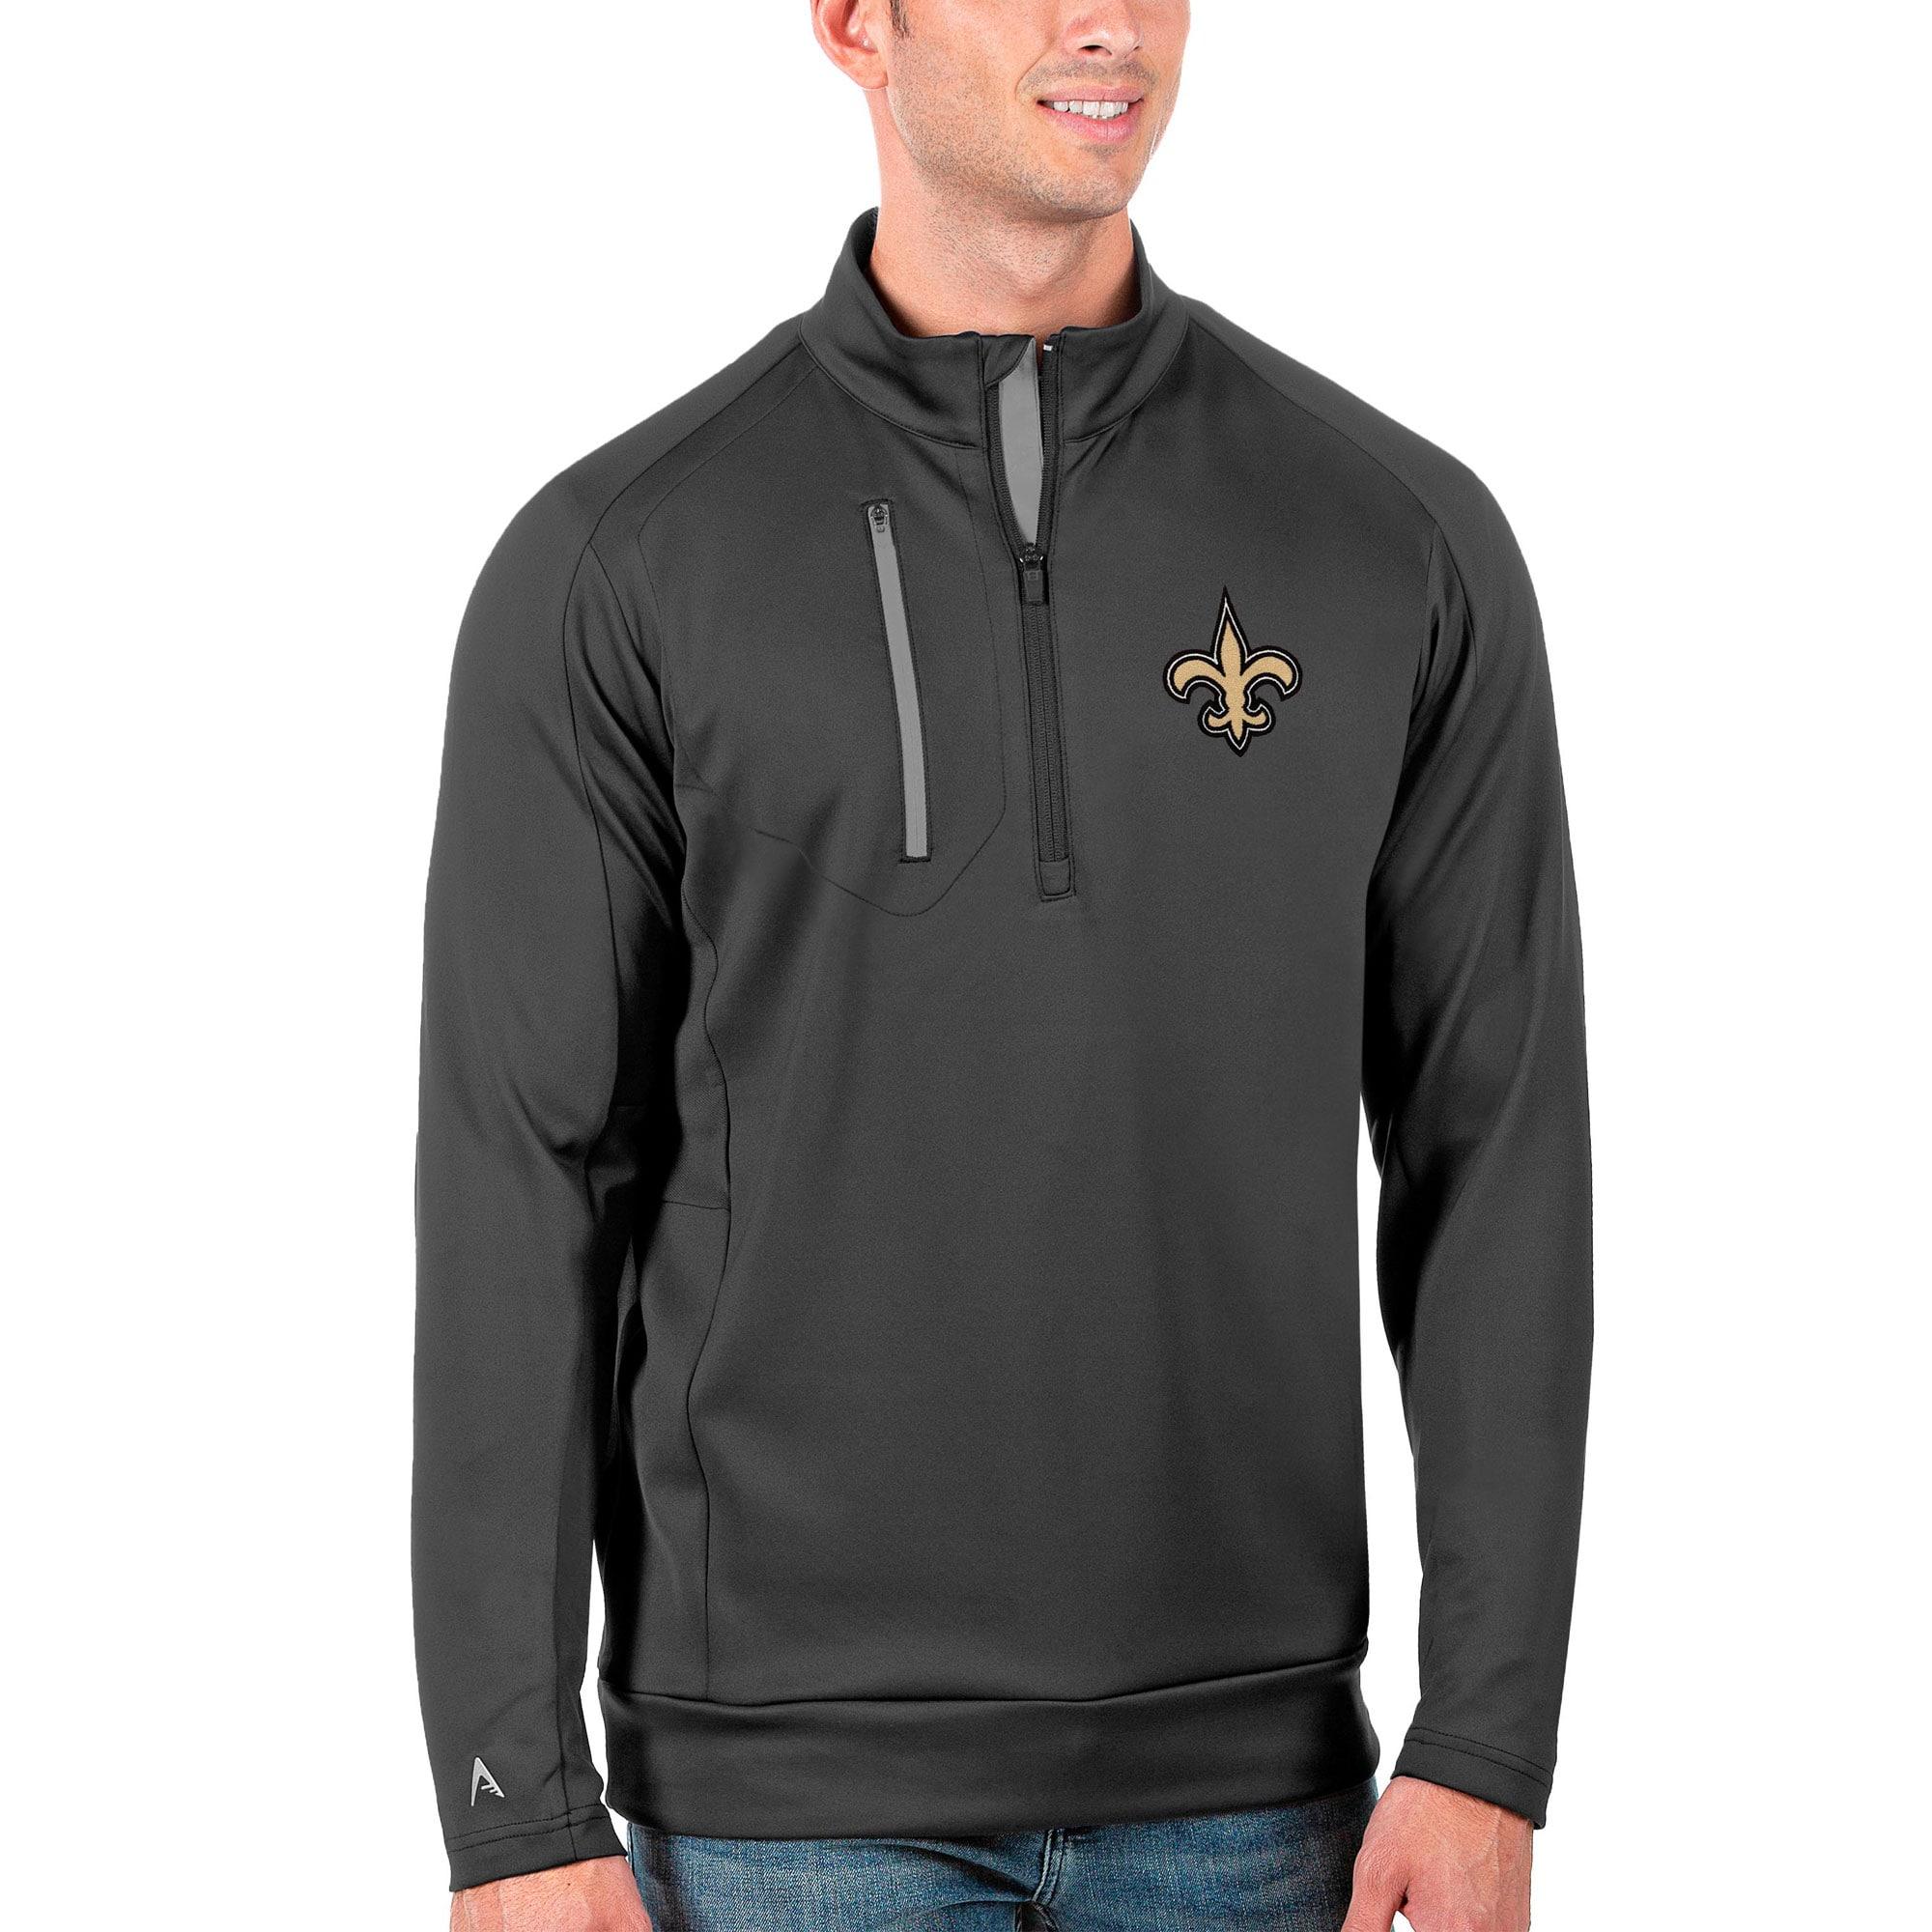 New Orleans Saints Antigua Generation Quarter-Zip Pullover Jacket - Charcoal/Silver